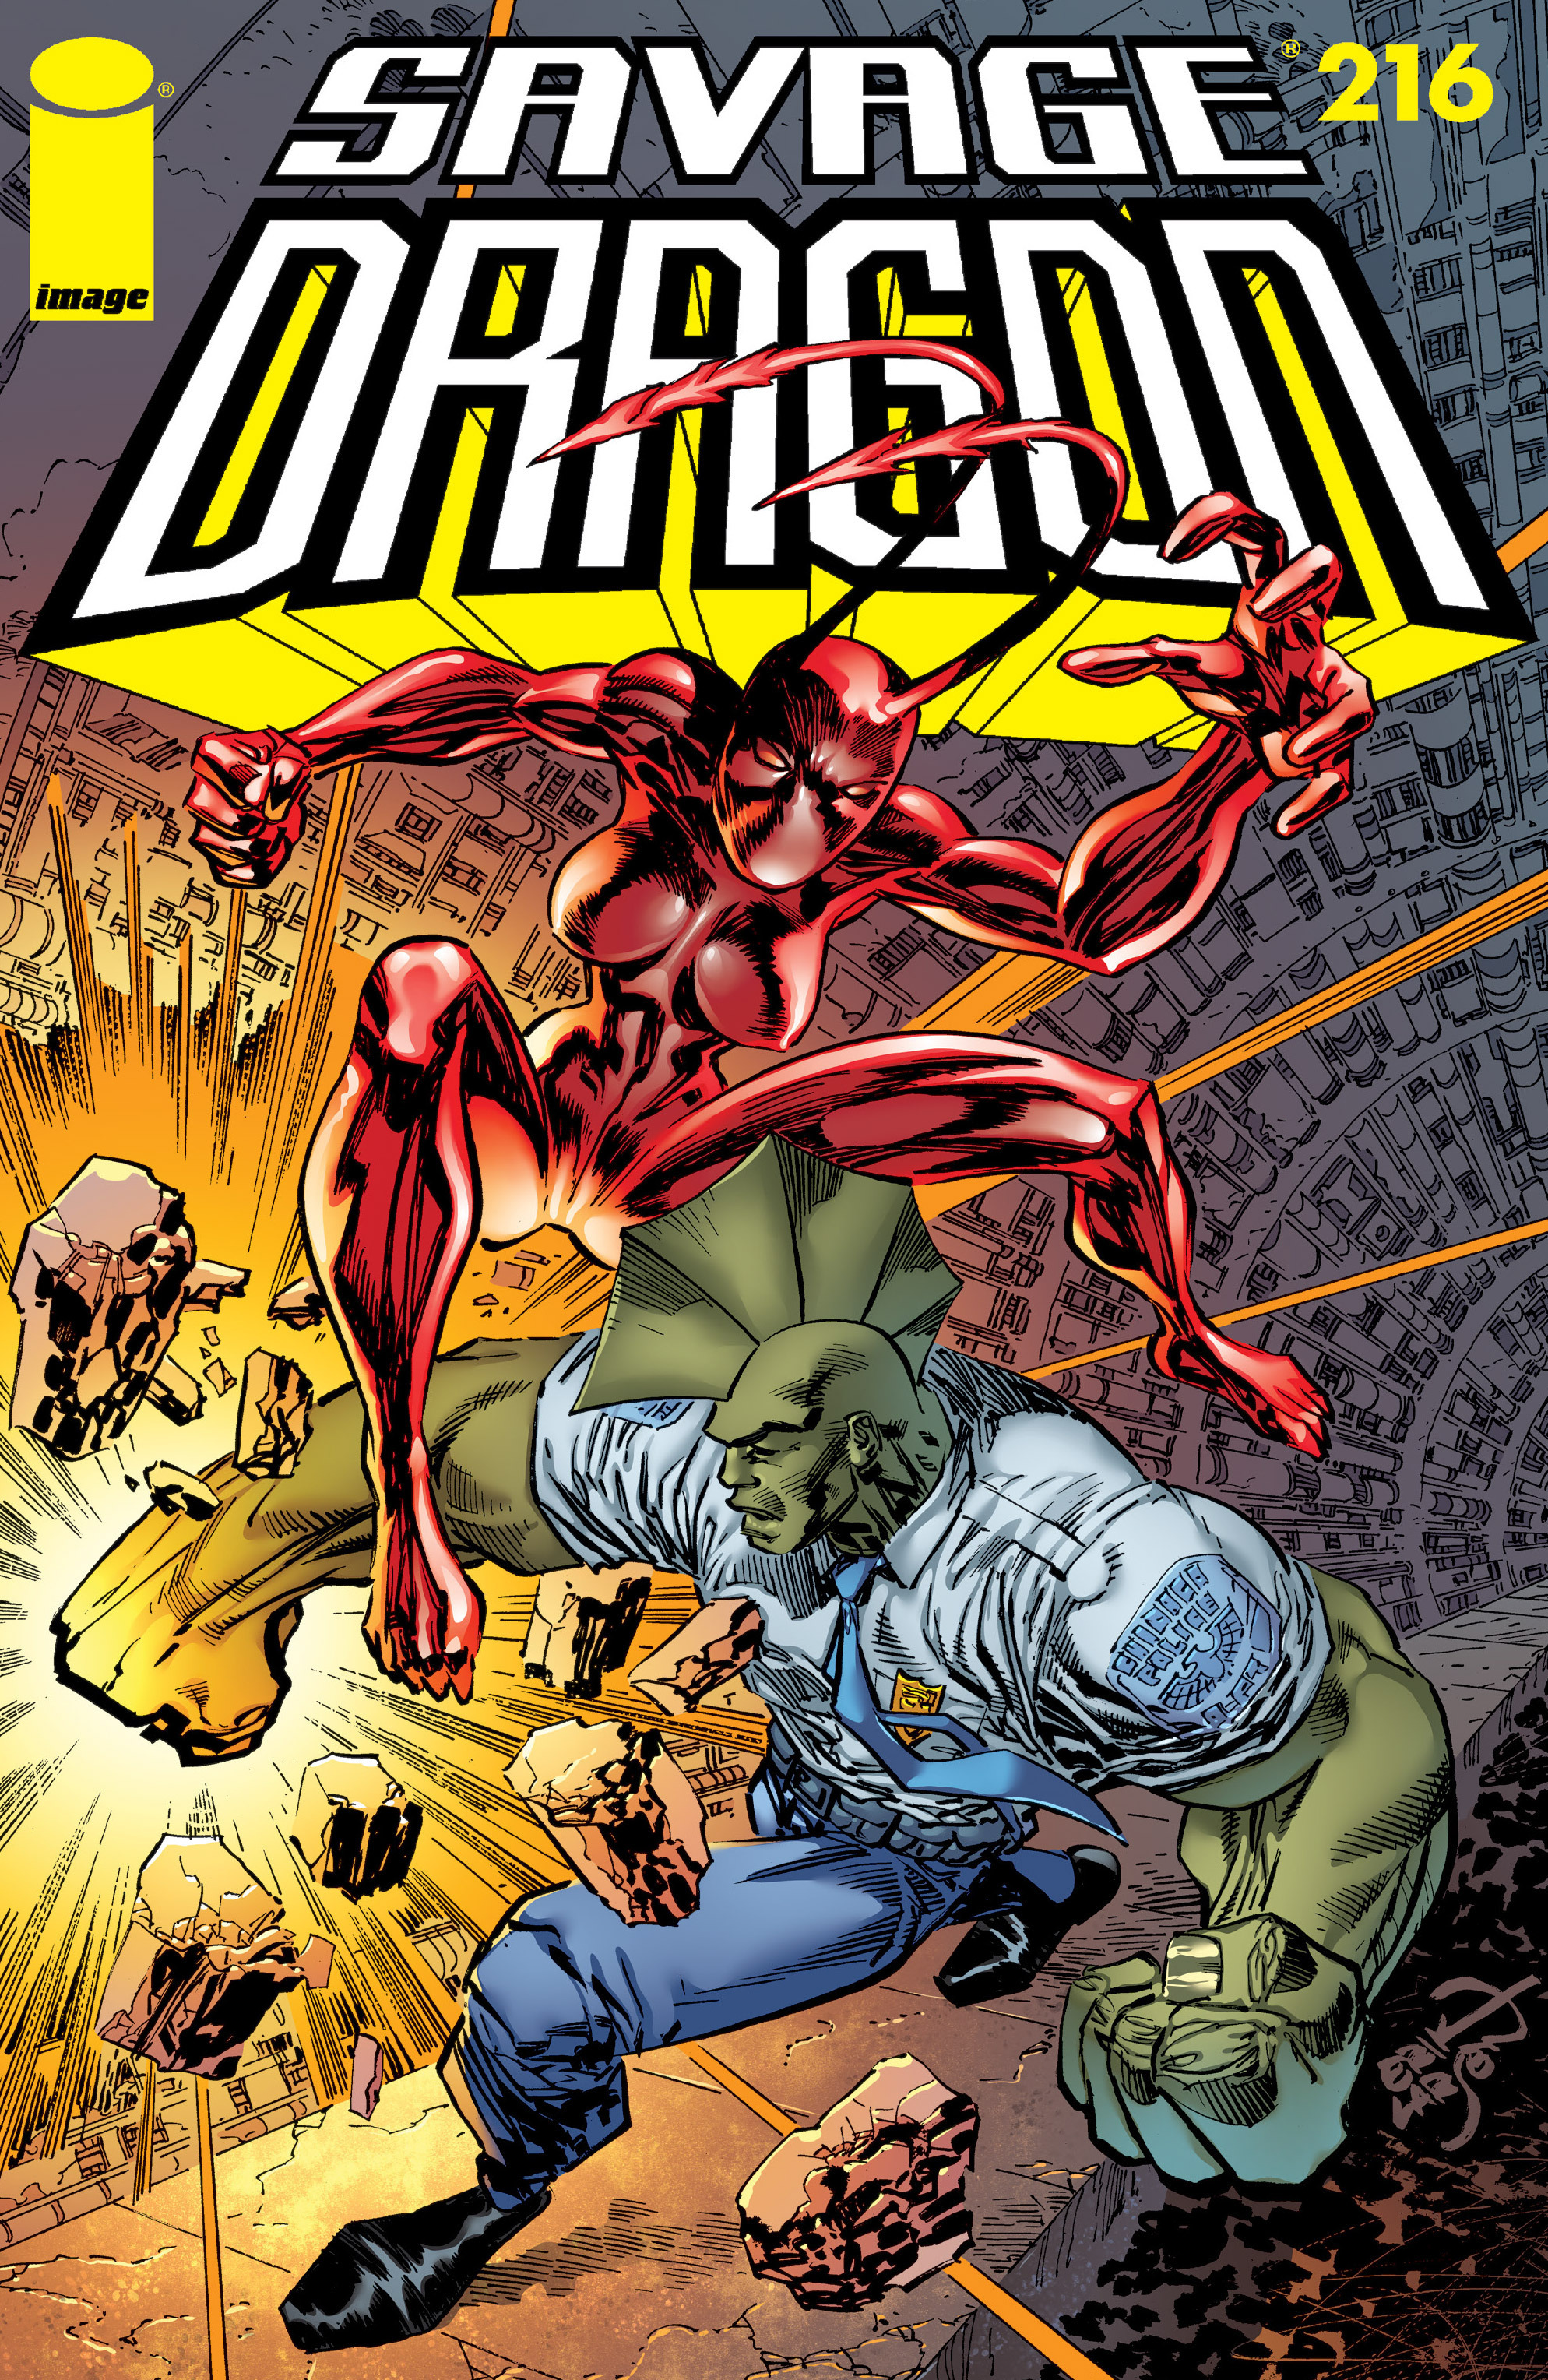 Cover Savage Dragon Vol.2 #216